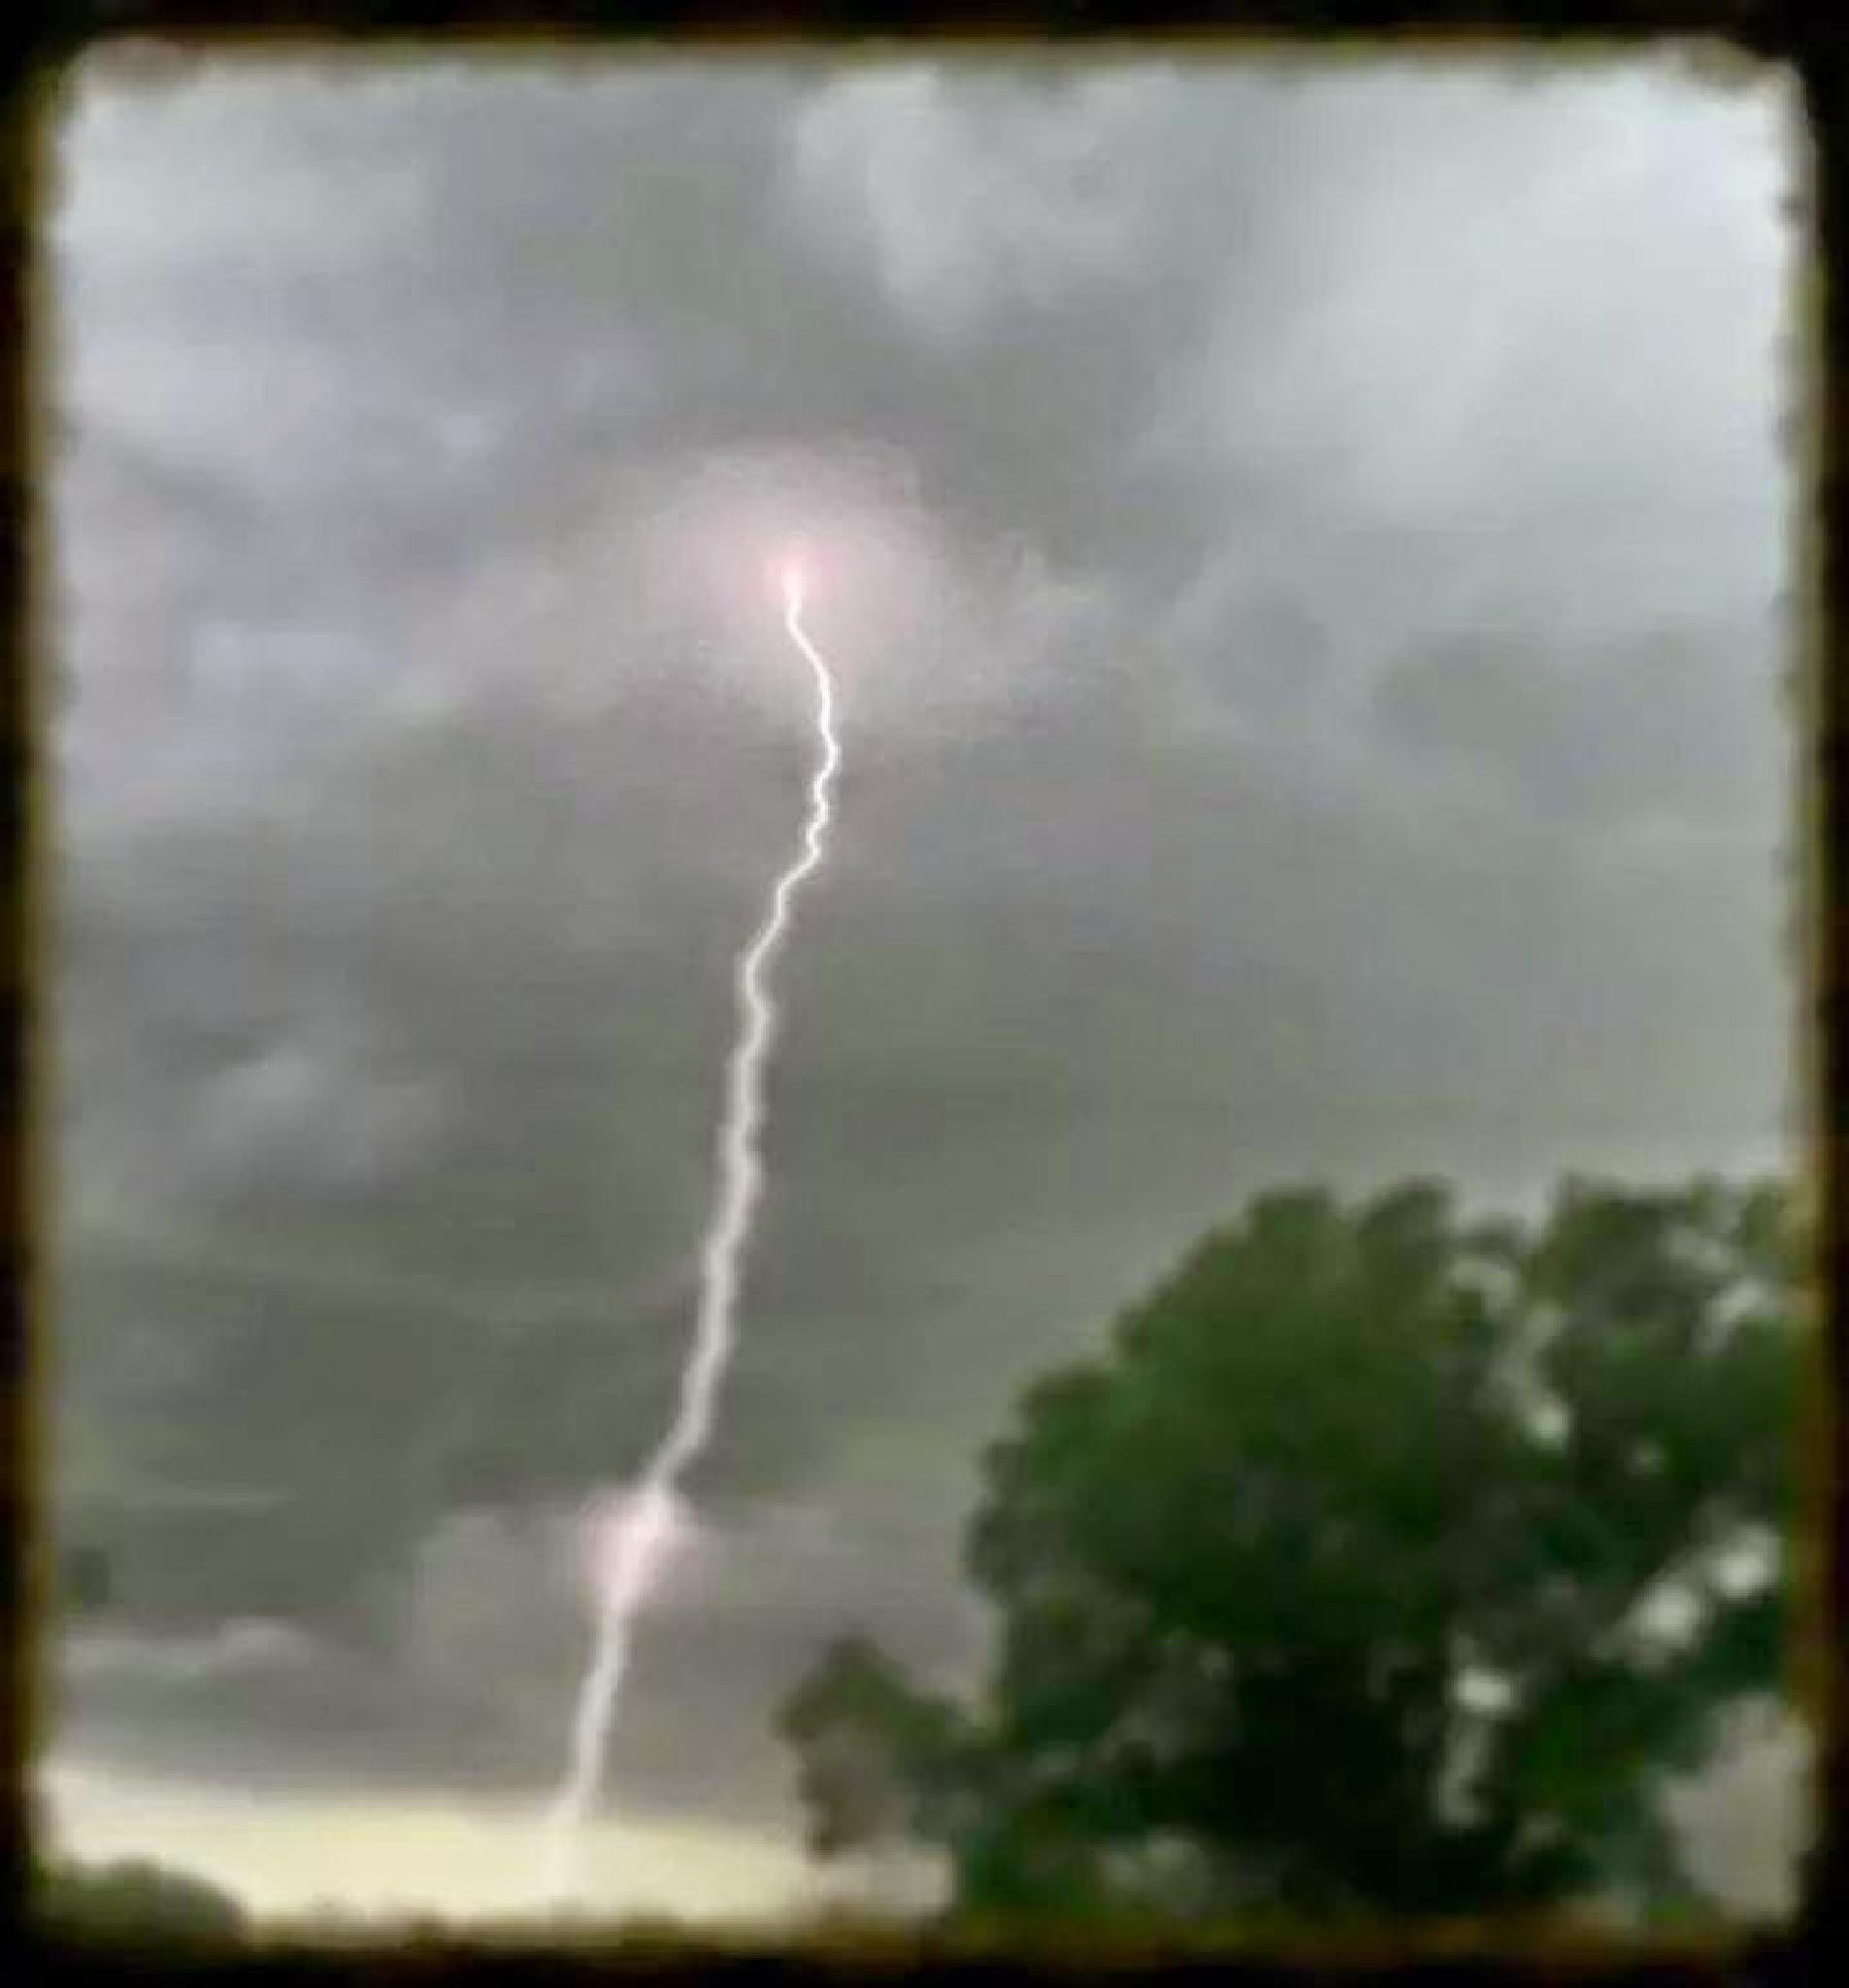 lightning strike by jessica.k.whitehead1